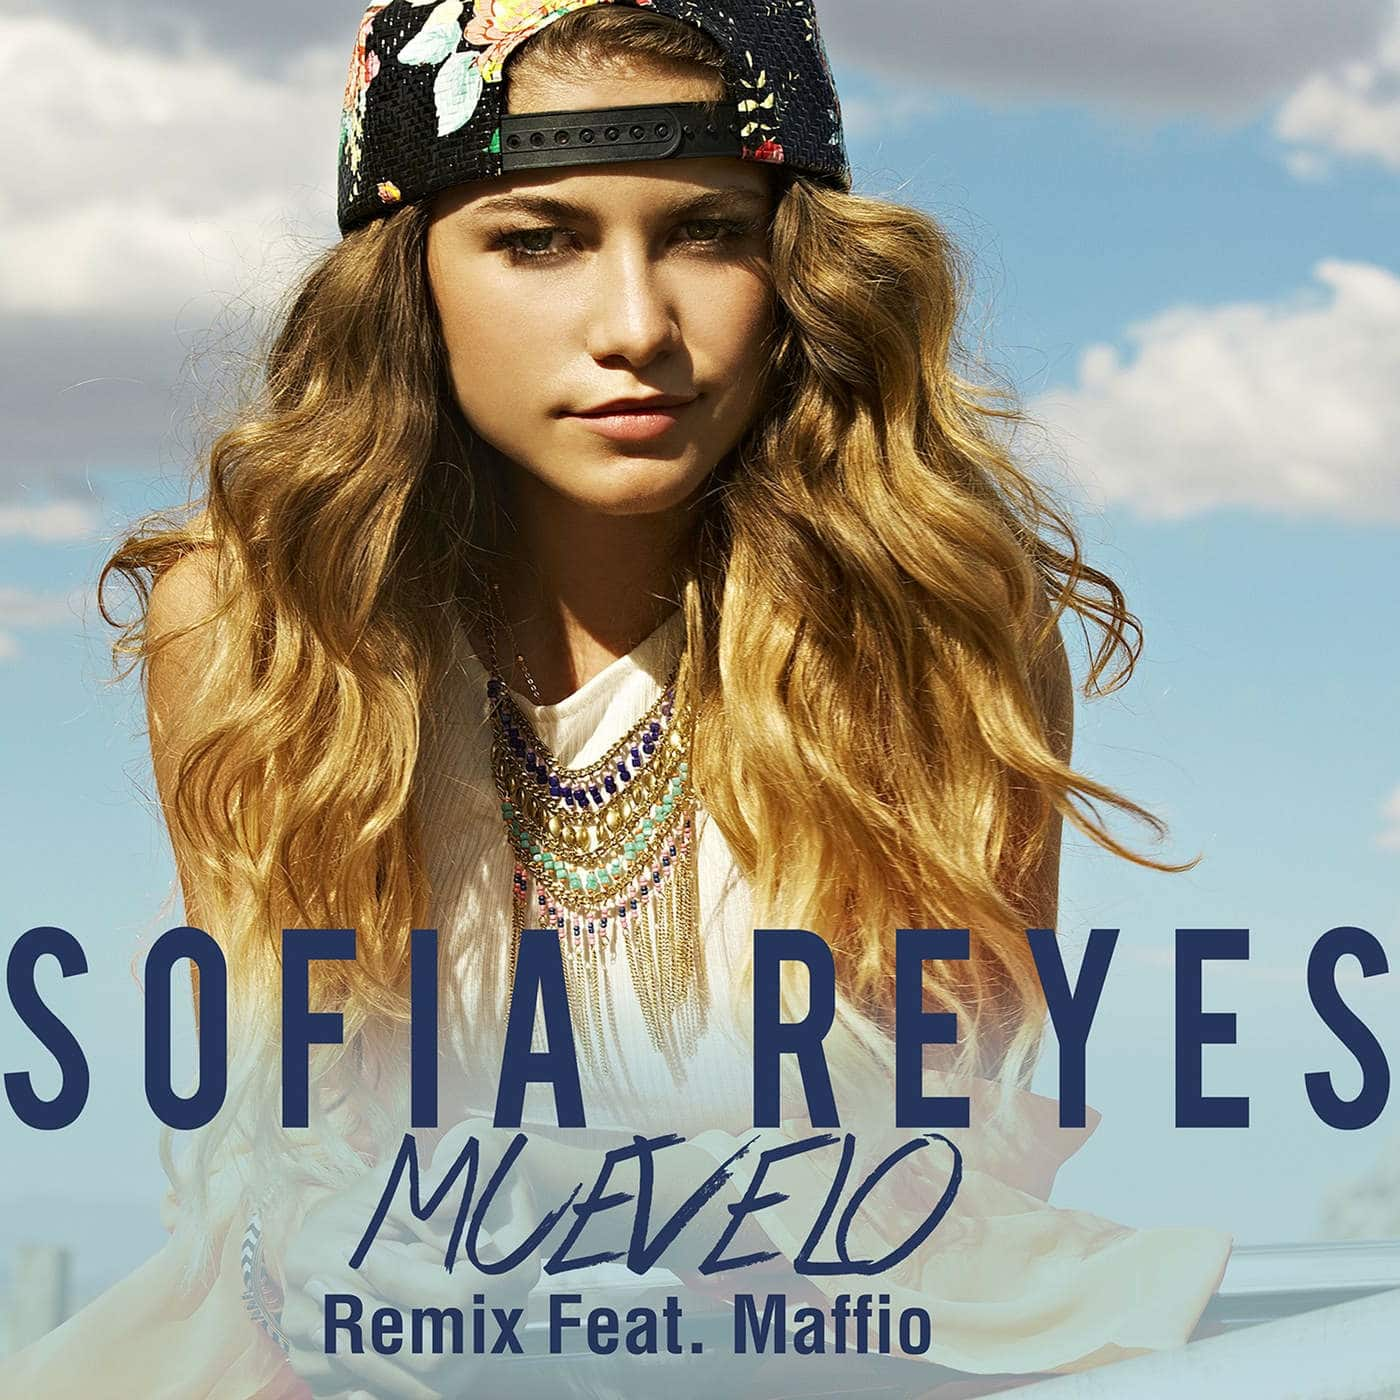 Muévelo Remix (feat. Maffio)